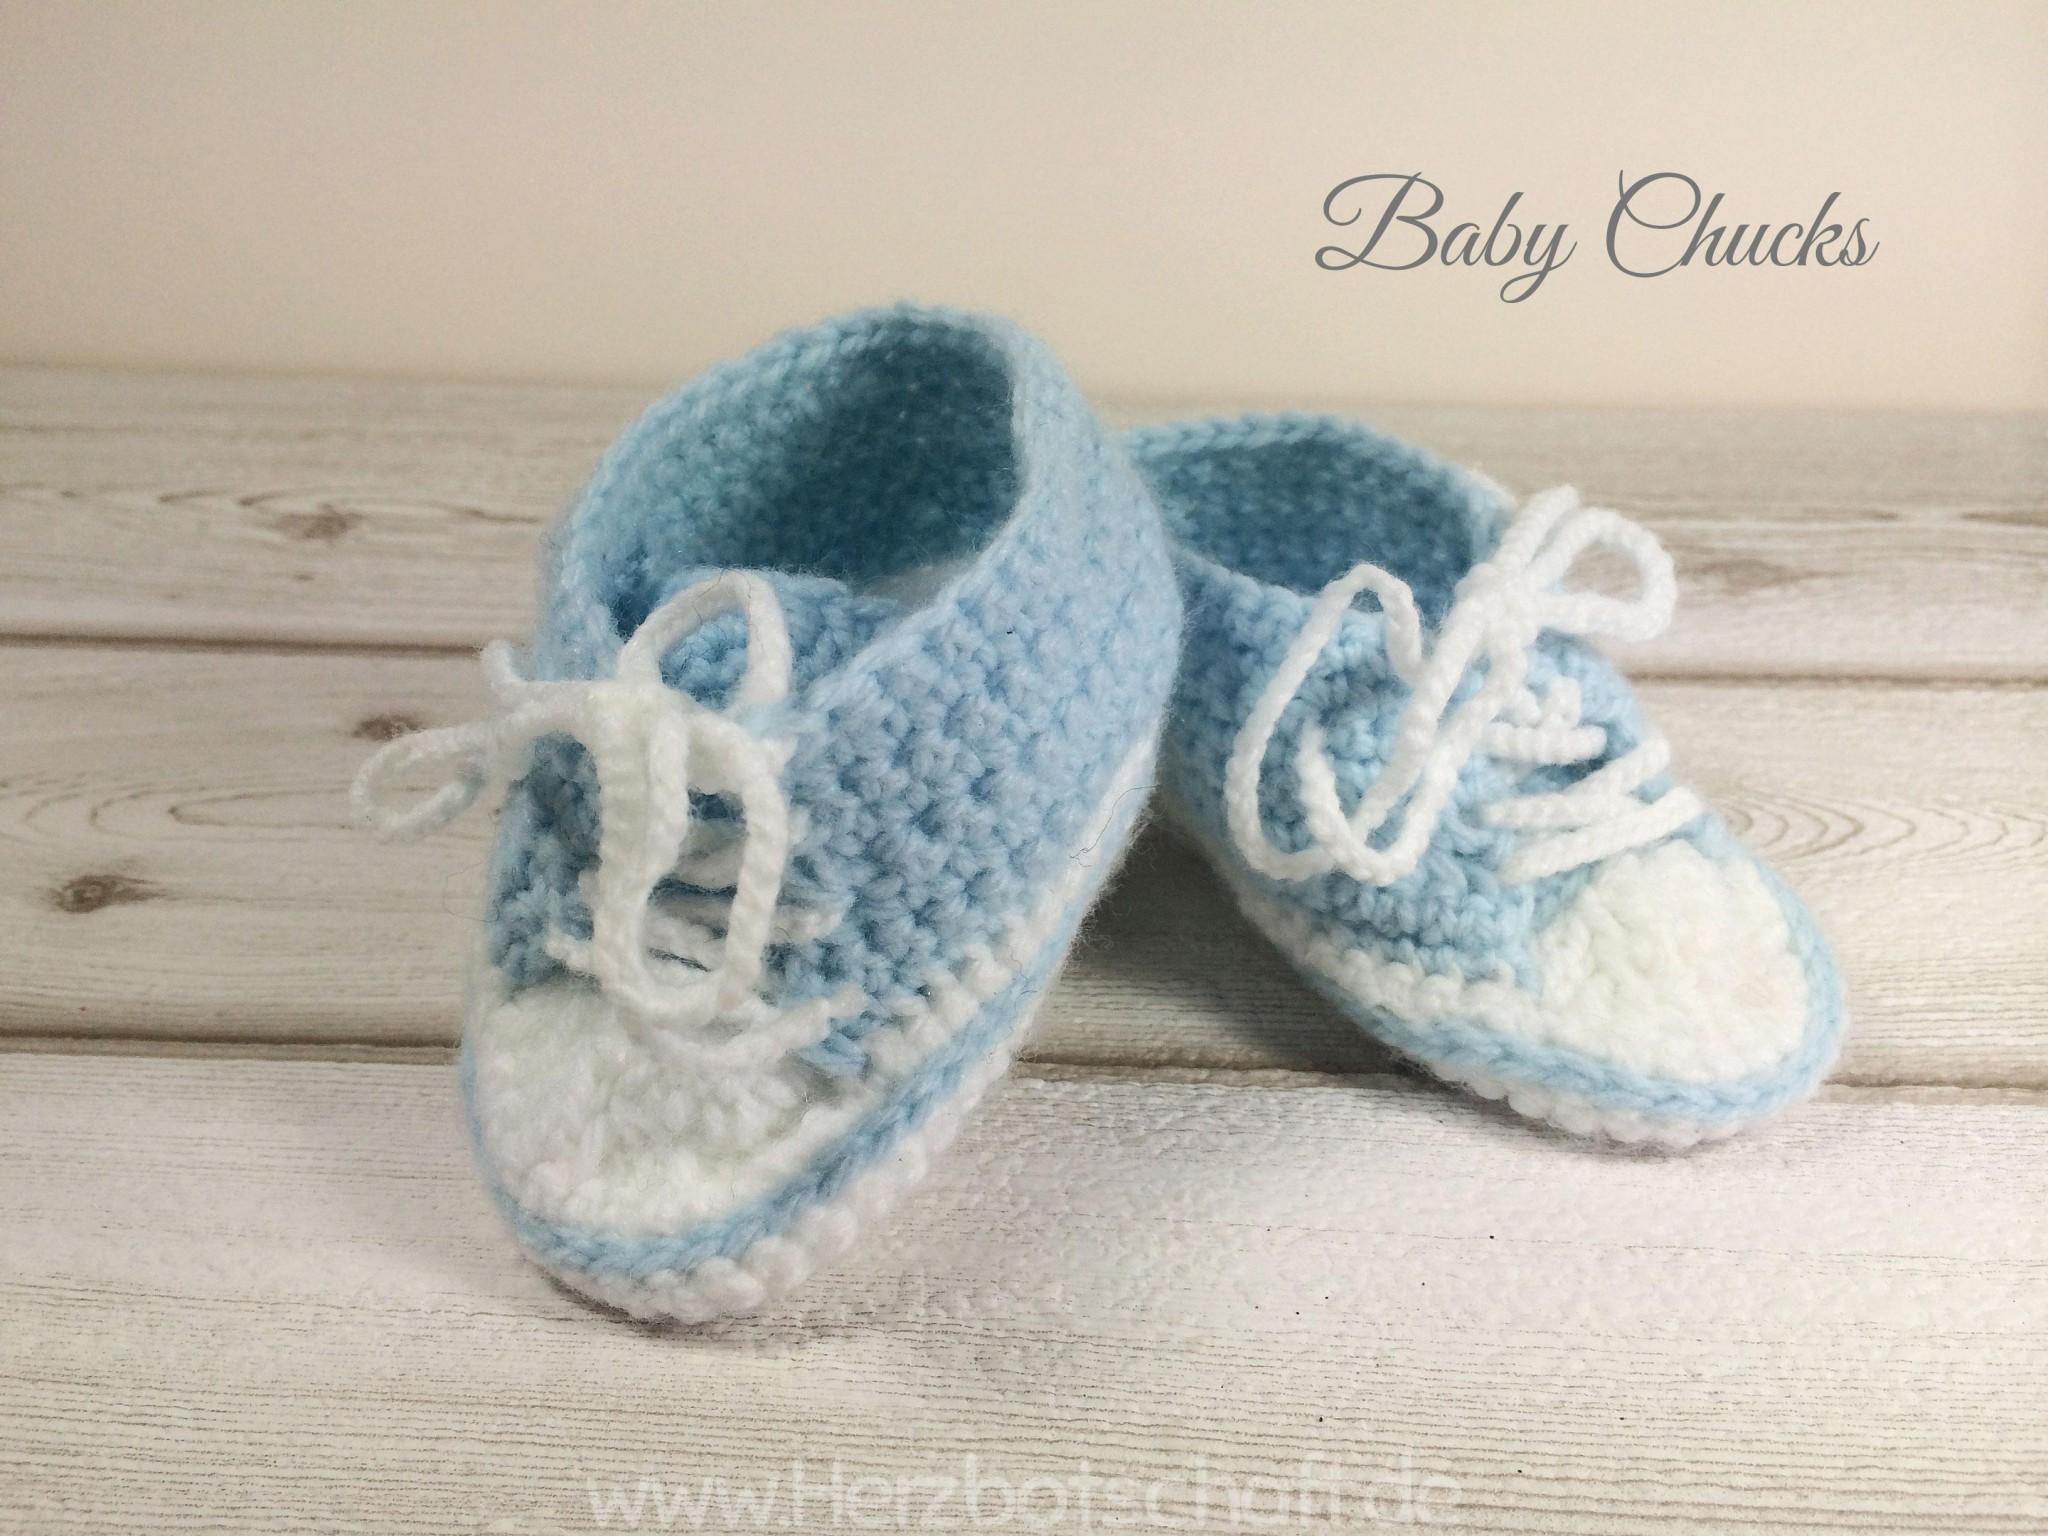 Anleitung Baby Chucks Häkeln Süße Babyschuhe Herzbotschaft